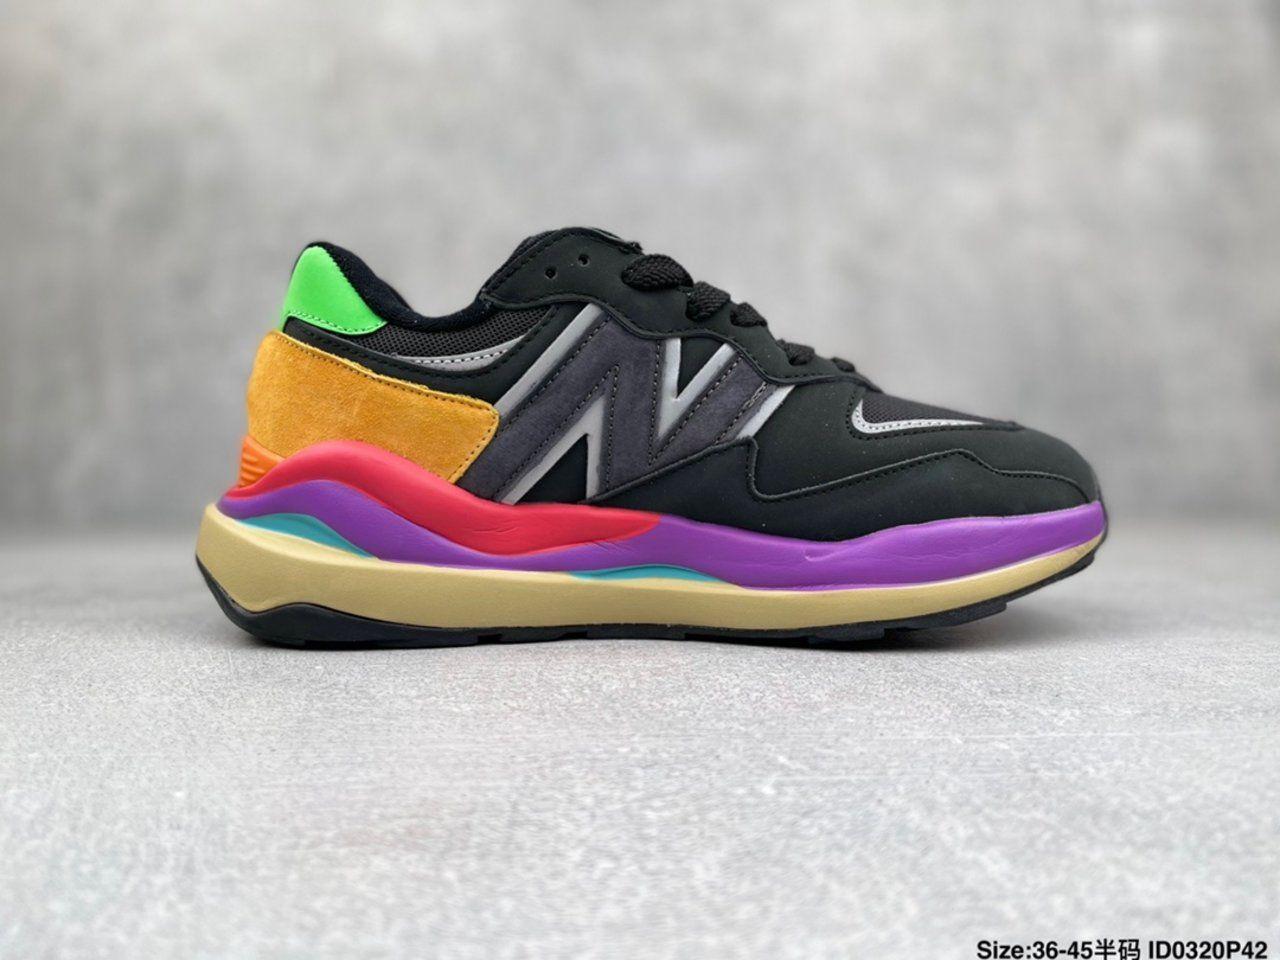 New Balance jogging shoes M5740LB Right